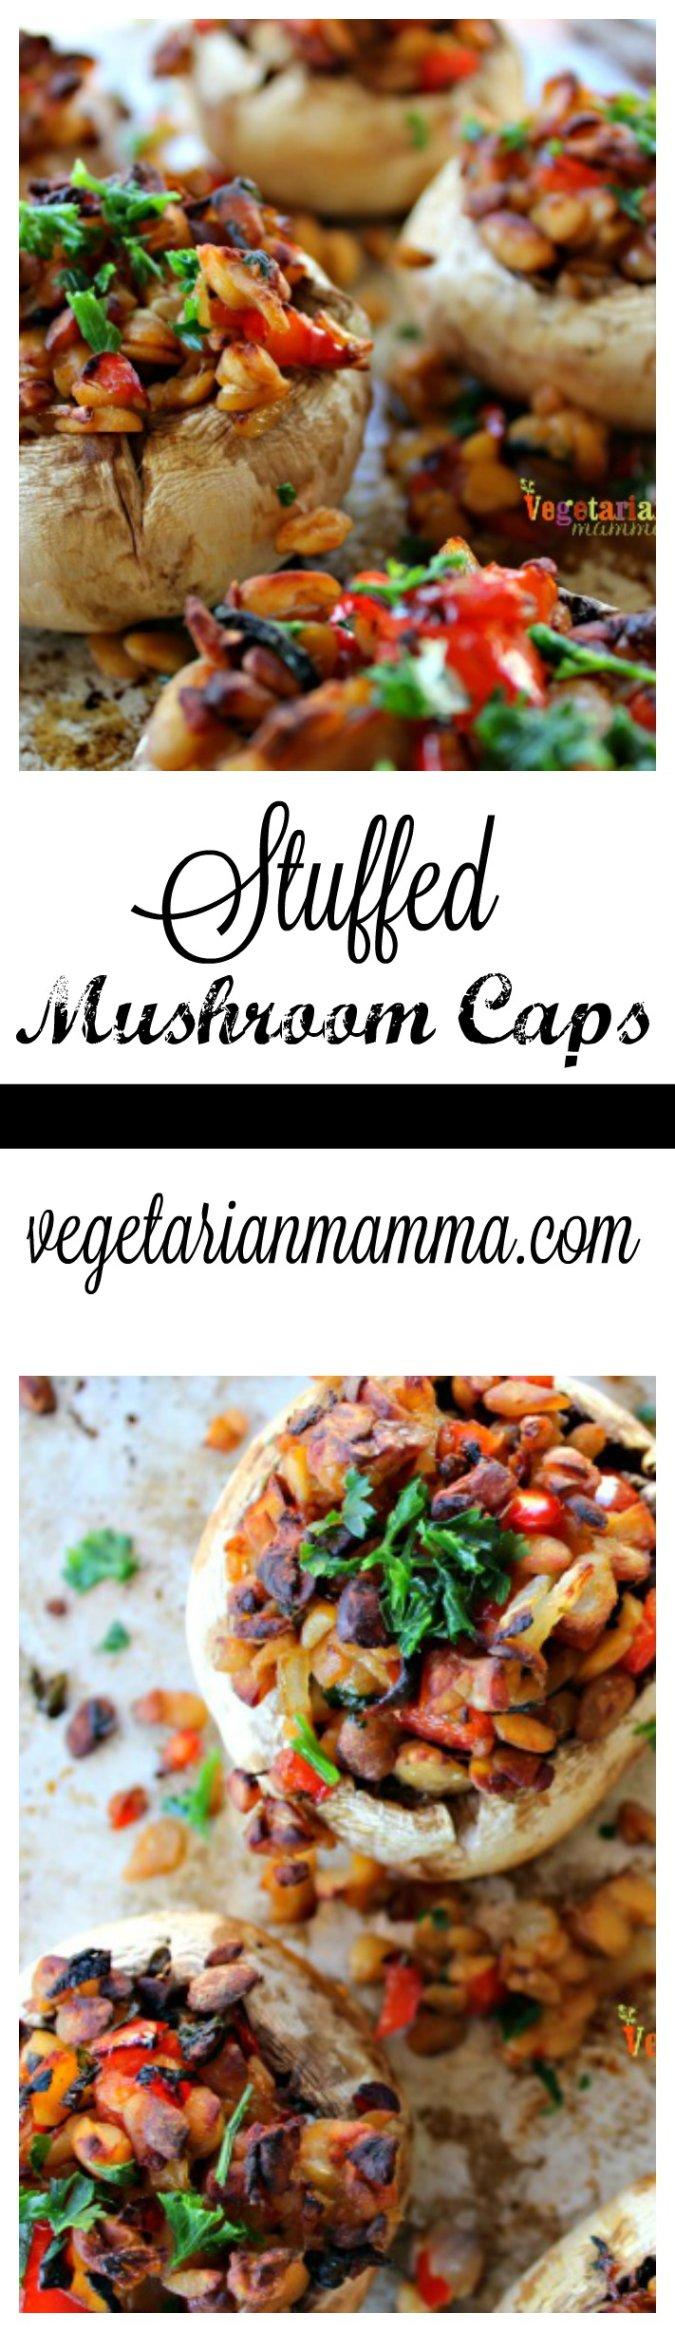 Stuffed Mushroom Caps @vegetarianmamma.com #mushroom #glutenfree #vegetarian